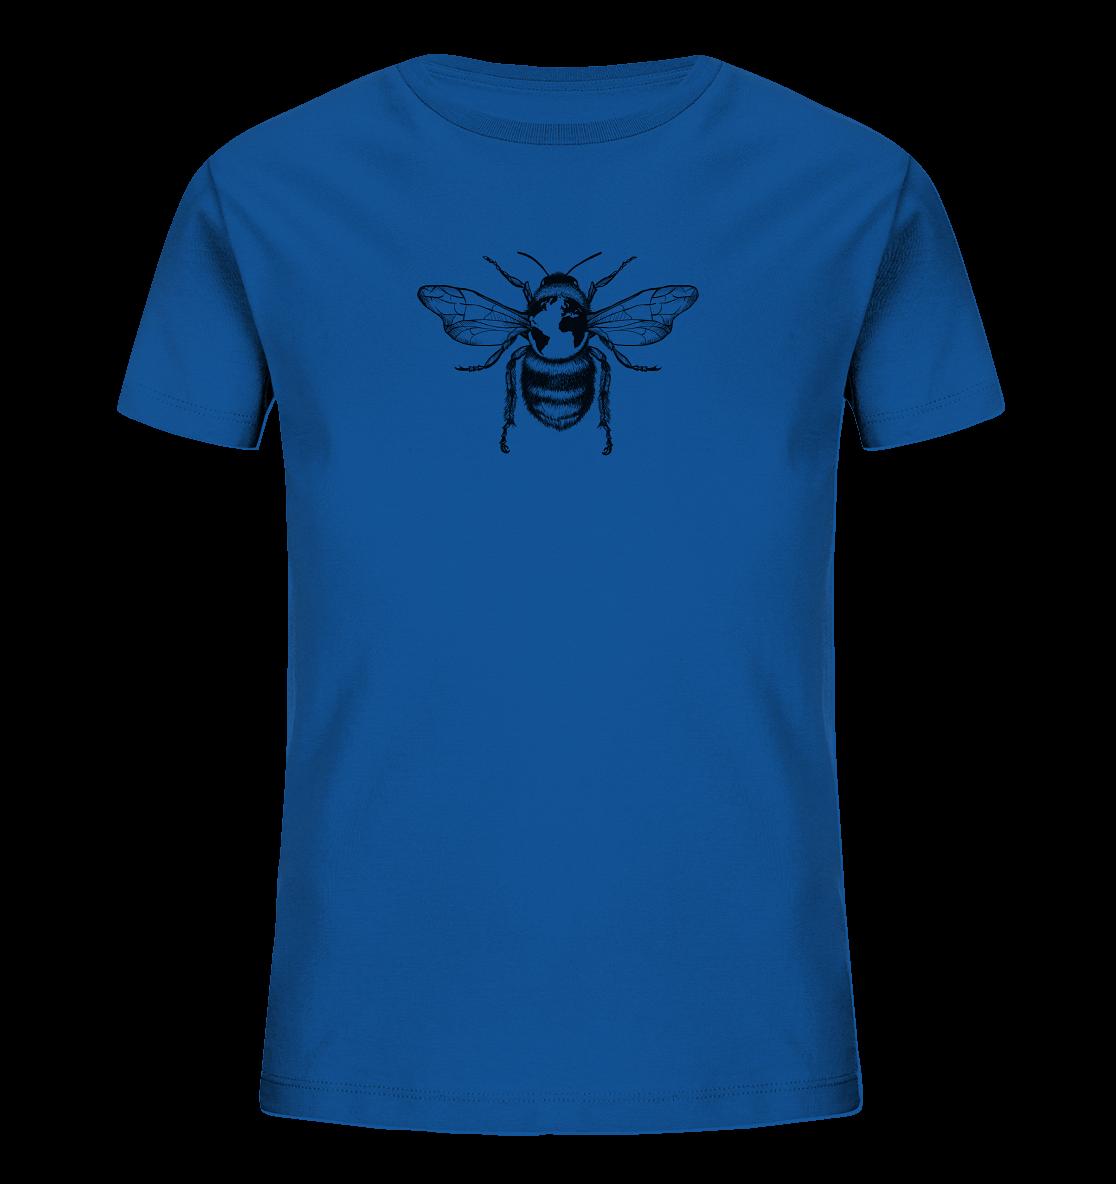 front-kids-organic-shirt-13569c-1116x-2.png